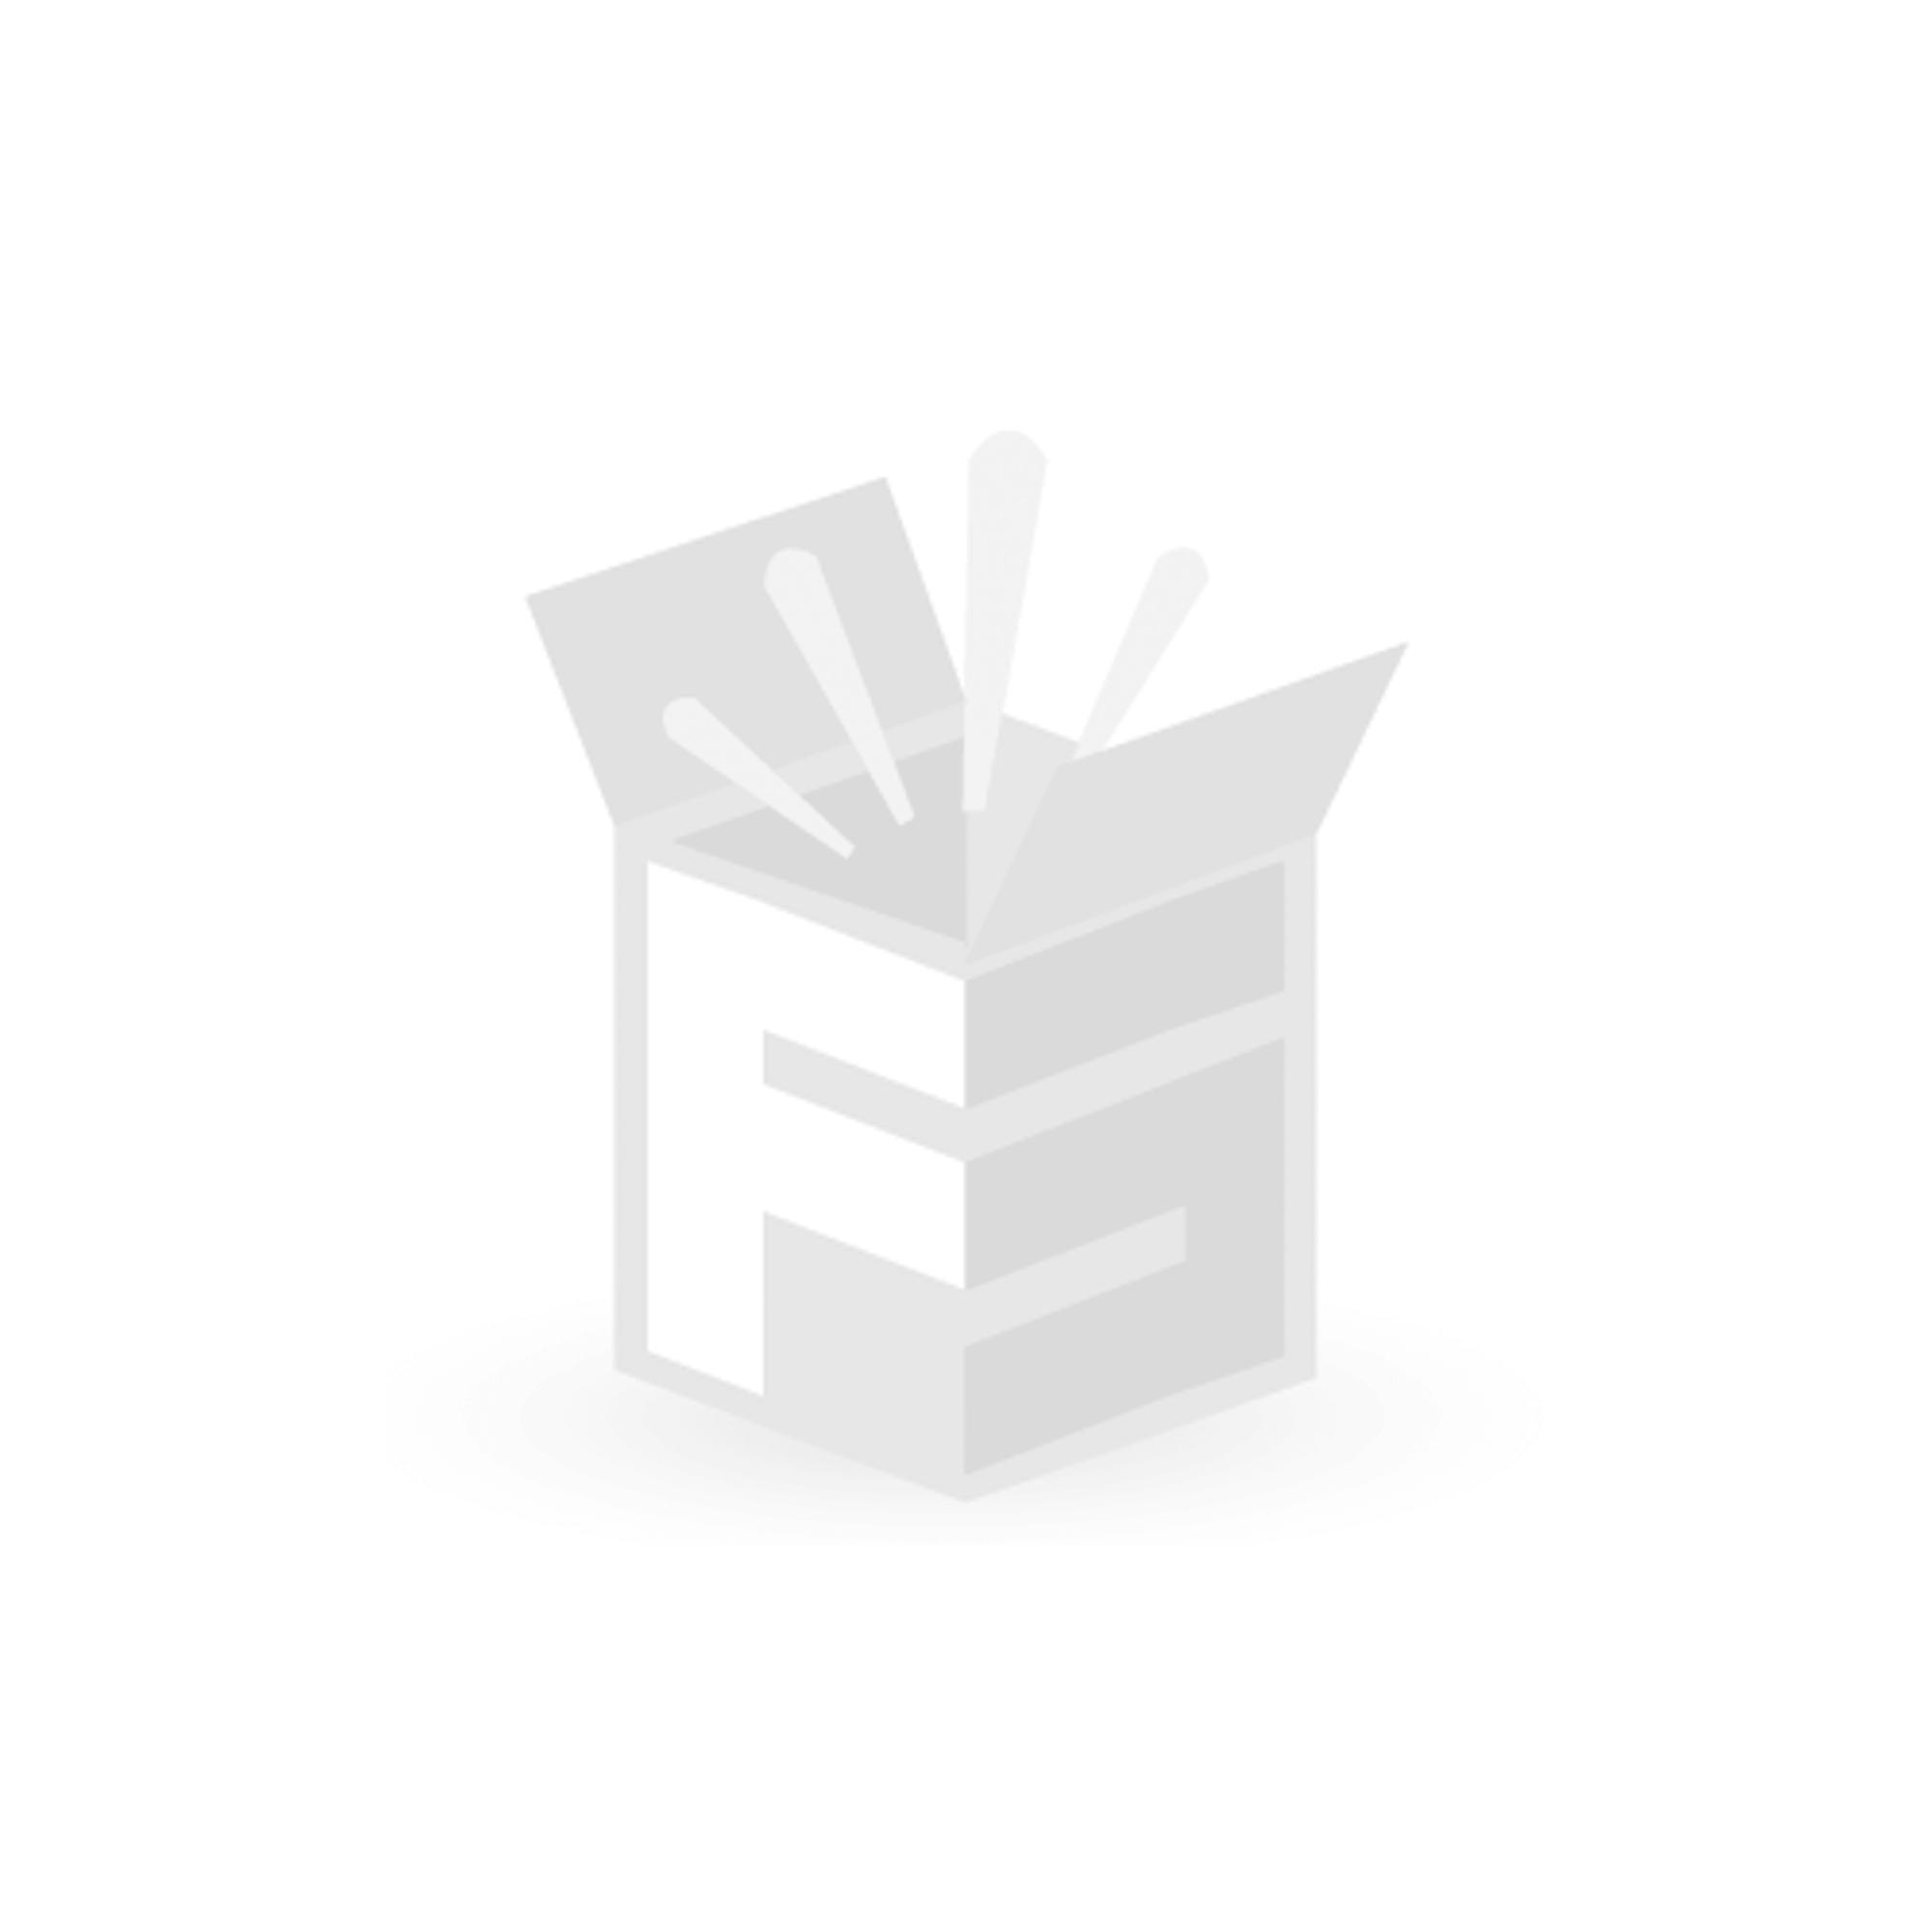 FS-STAR Bierglas 4er Set